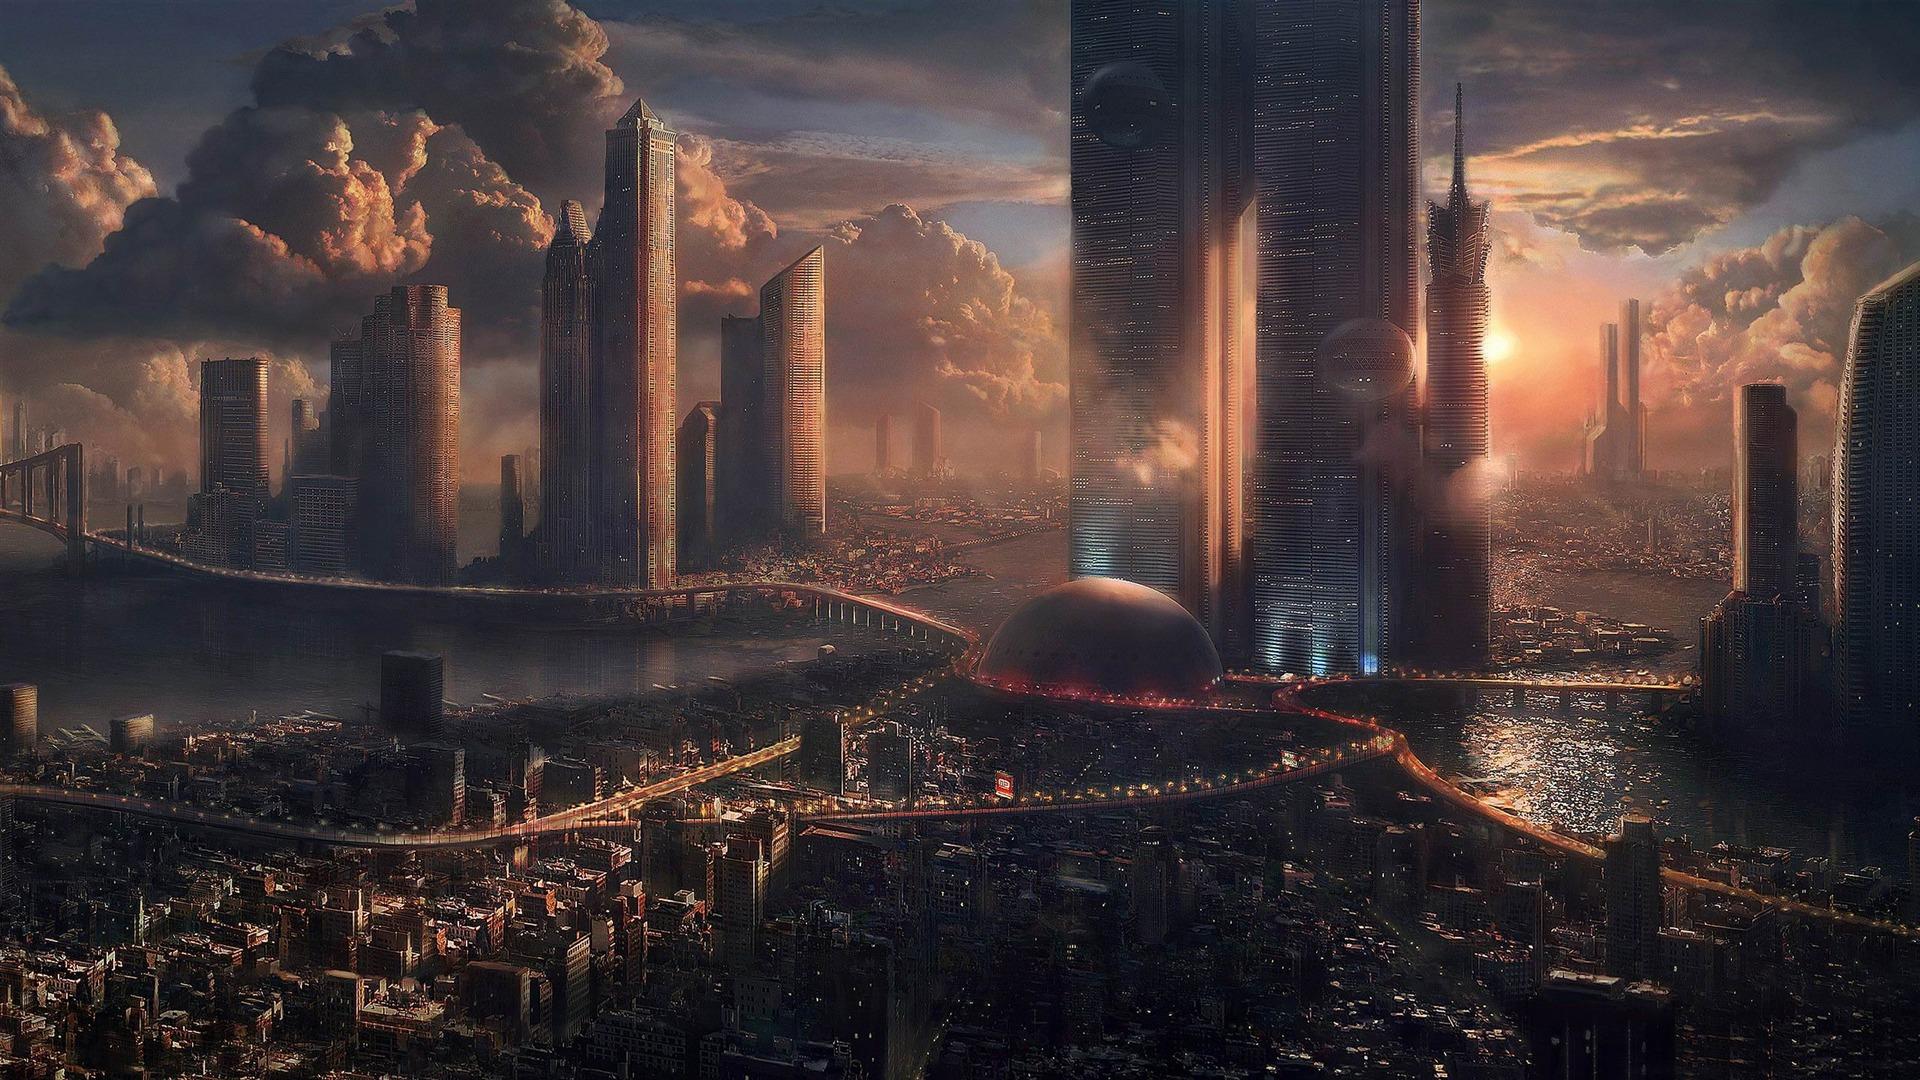 Vos plus belles photos - Page 6 Futuristic_cityscape-World_of_fantasy_art_design_HD_wallpaper_1920x1080